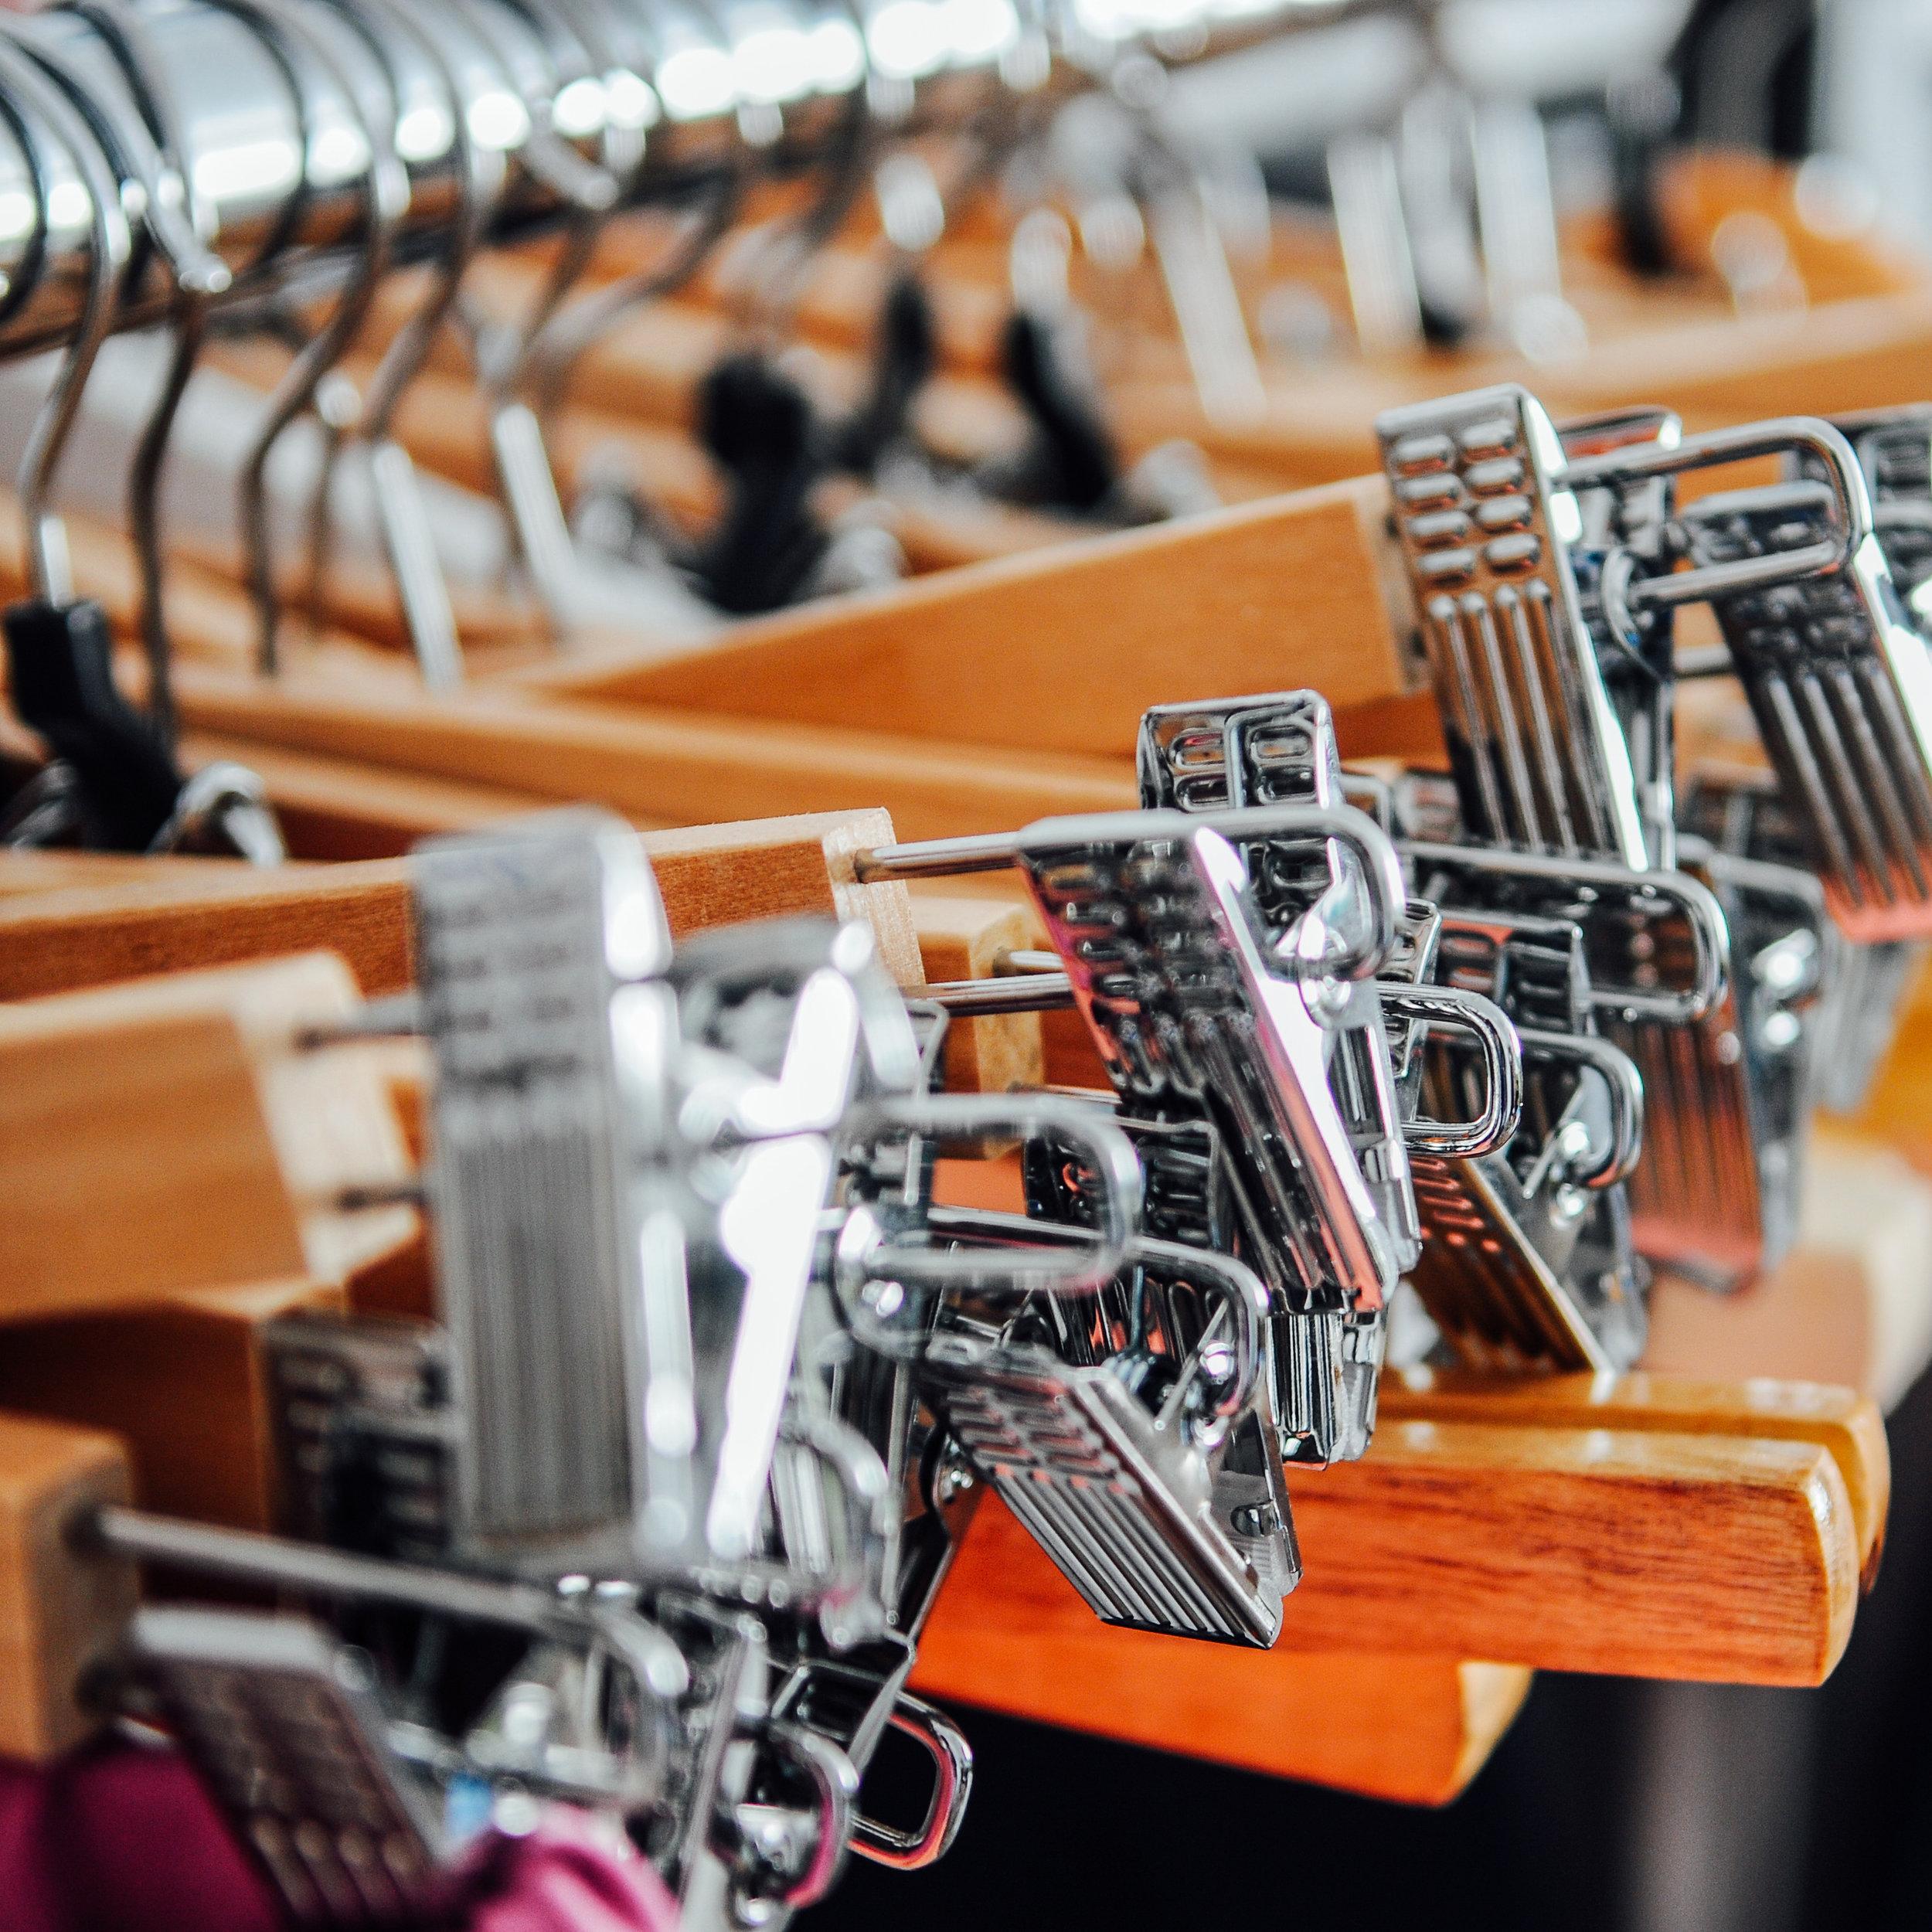 hangers-metal-wood-clothes-80412.jpg